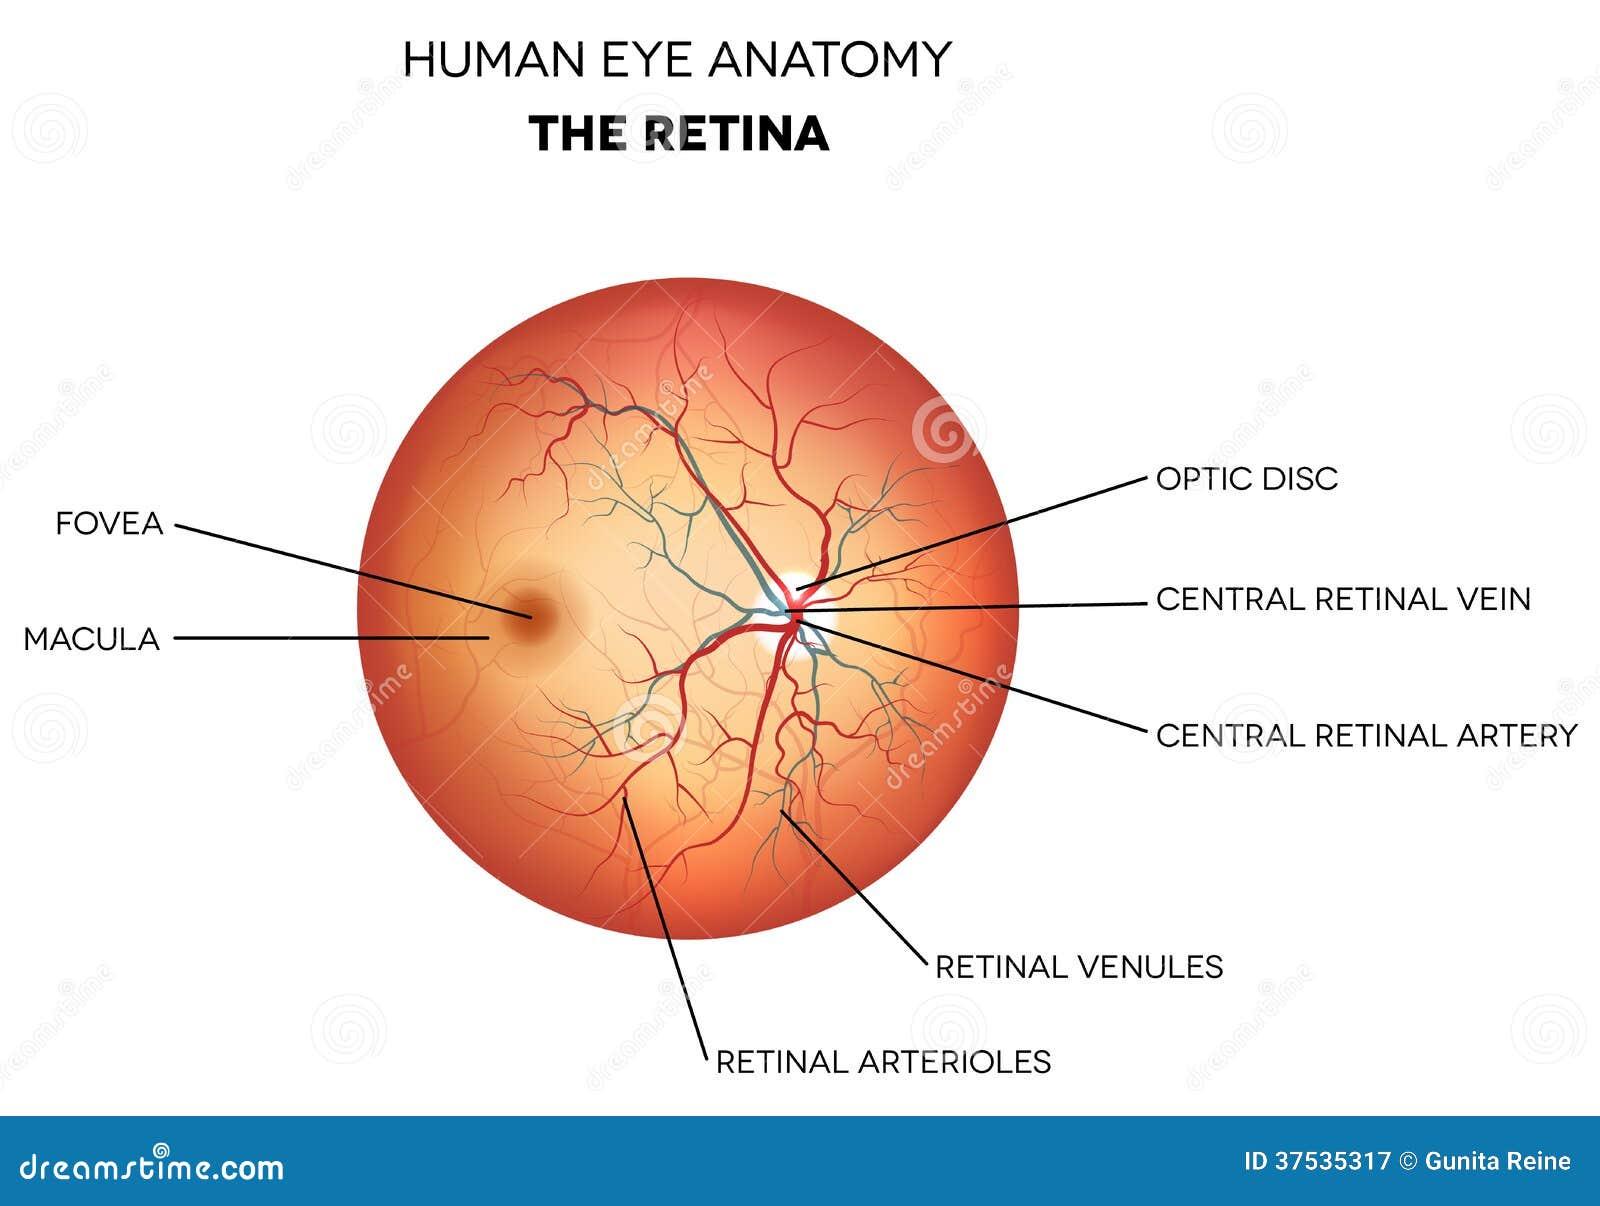 Anatomia del ojo humano macula : Trangorex iv